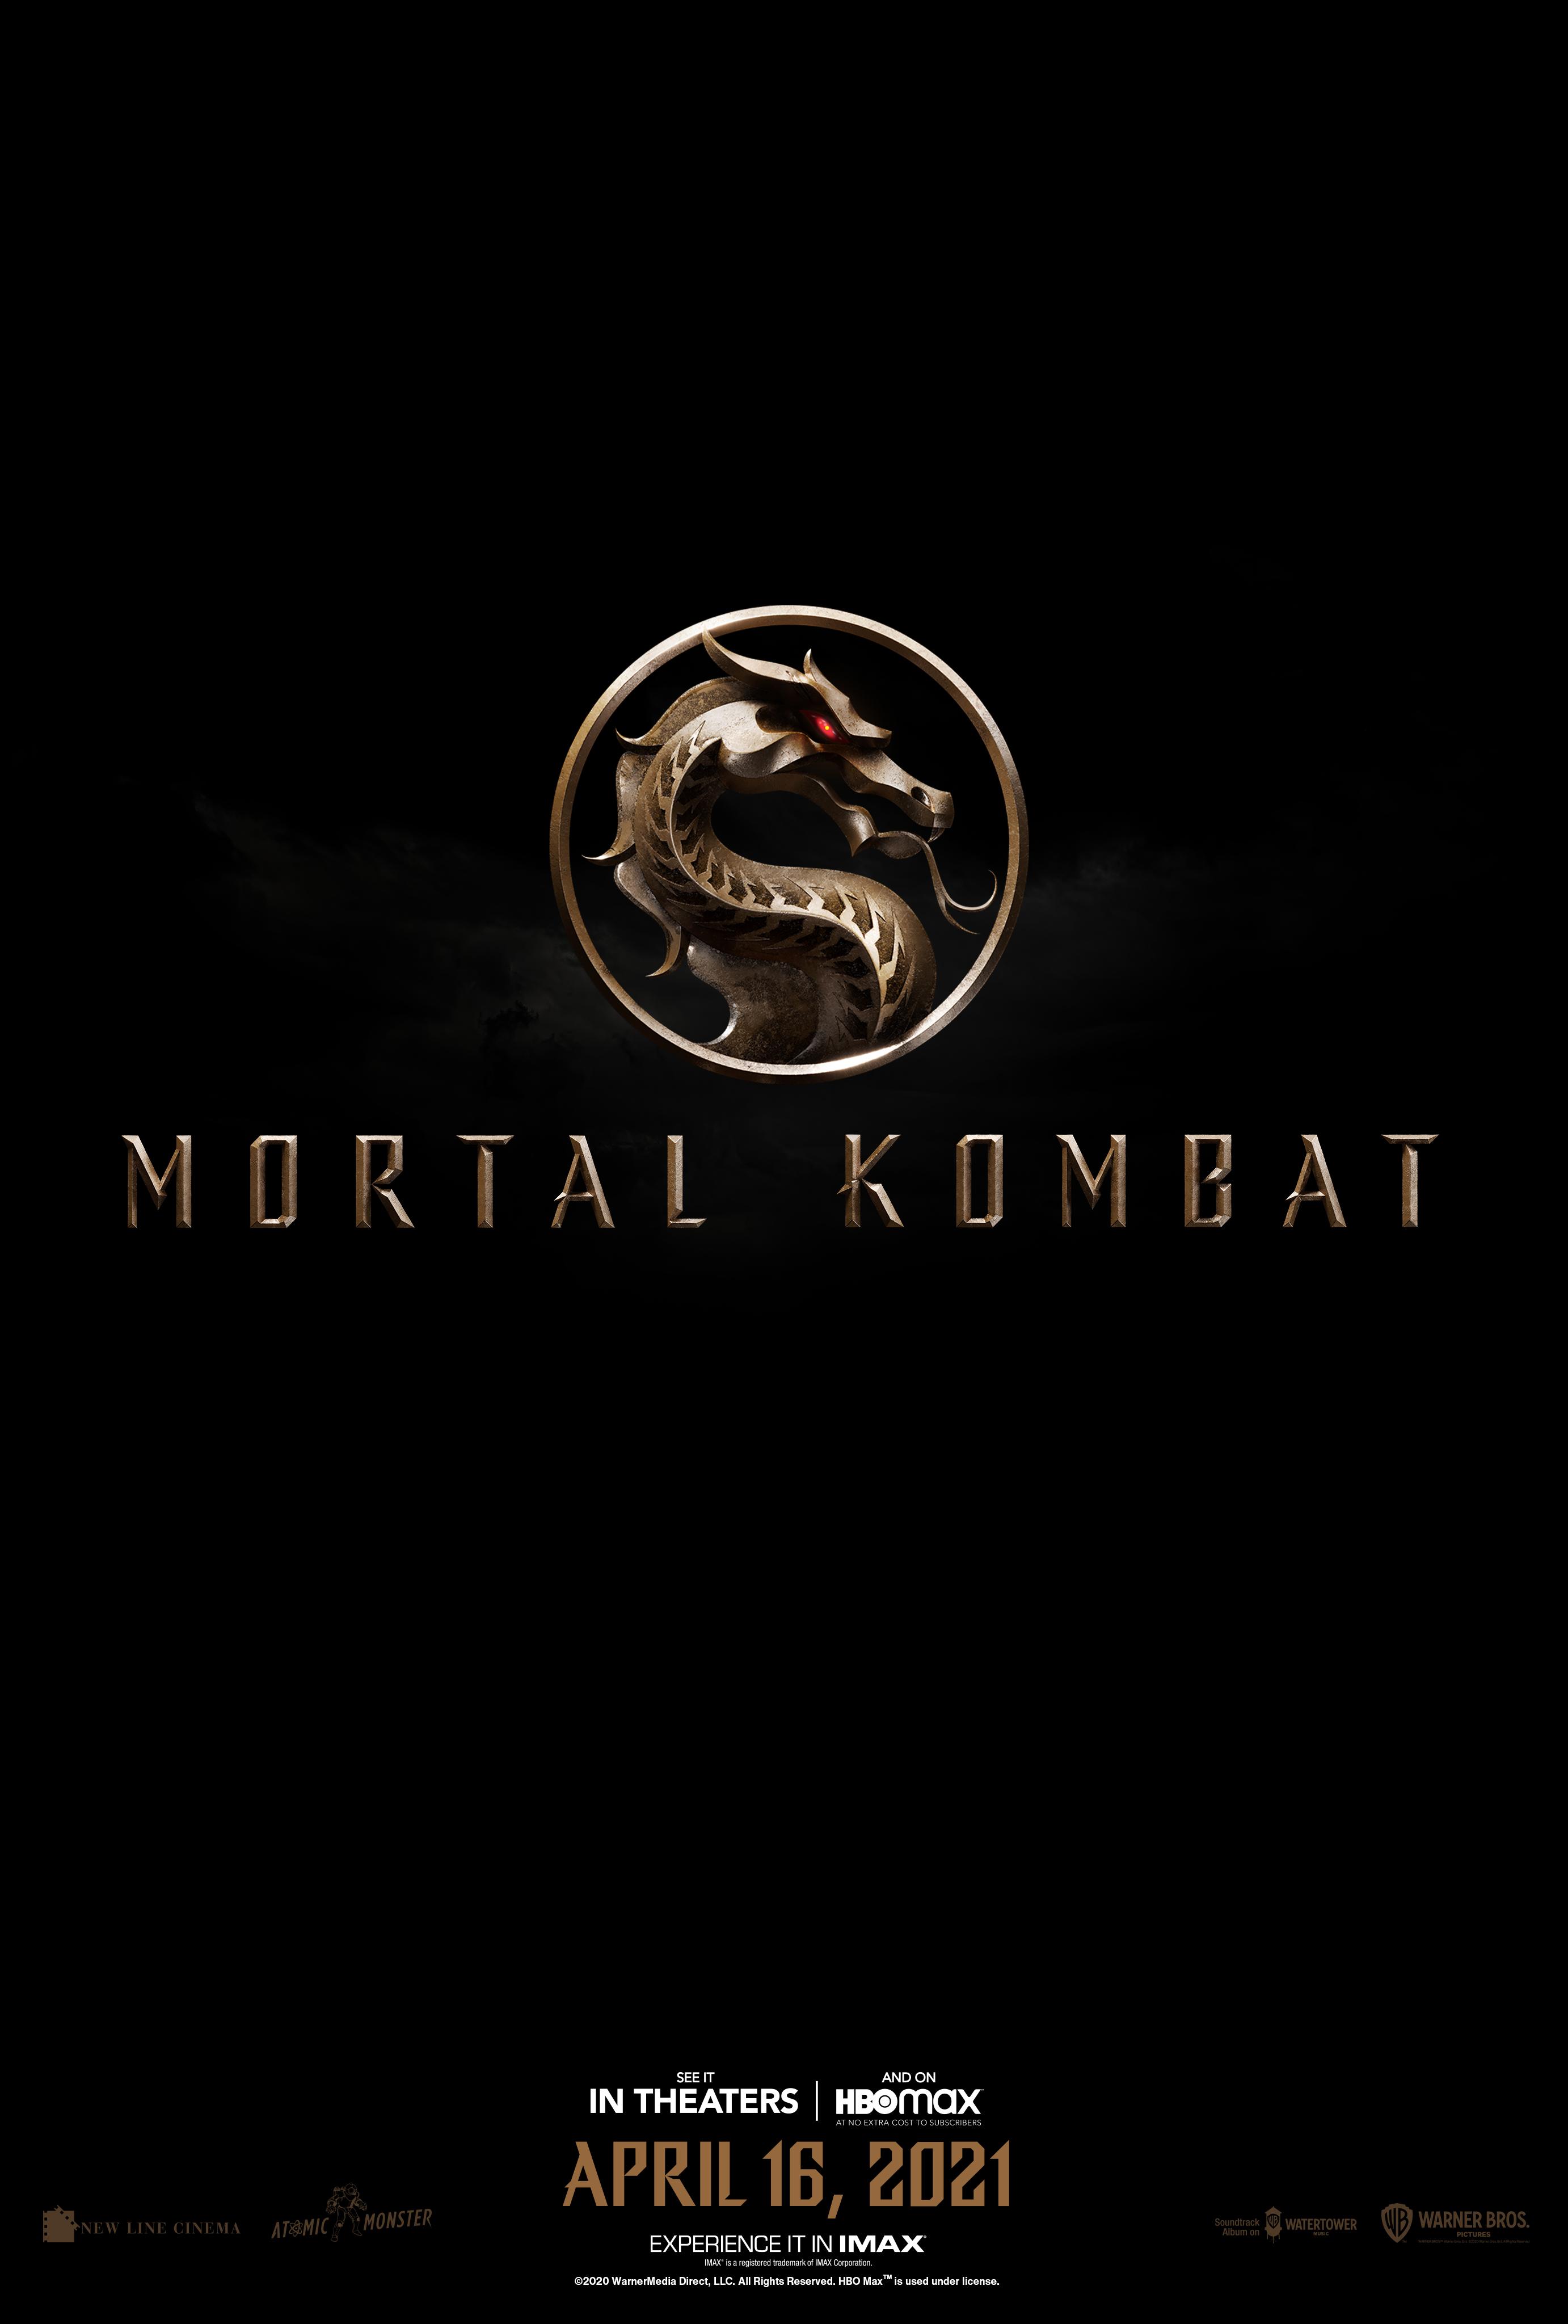 Download Filme Mortal Kombat Torrent 2021 Qualidade Hd